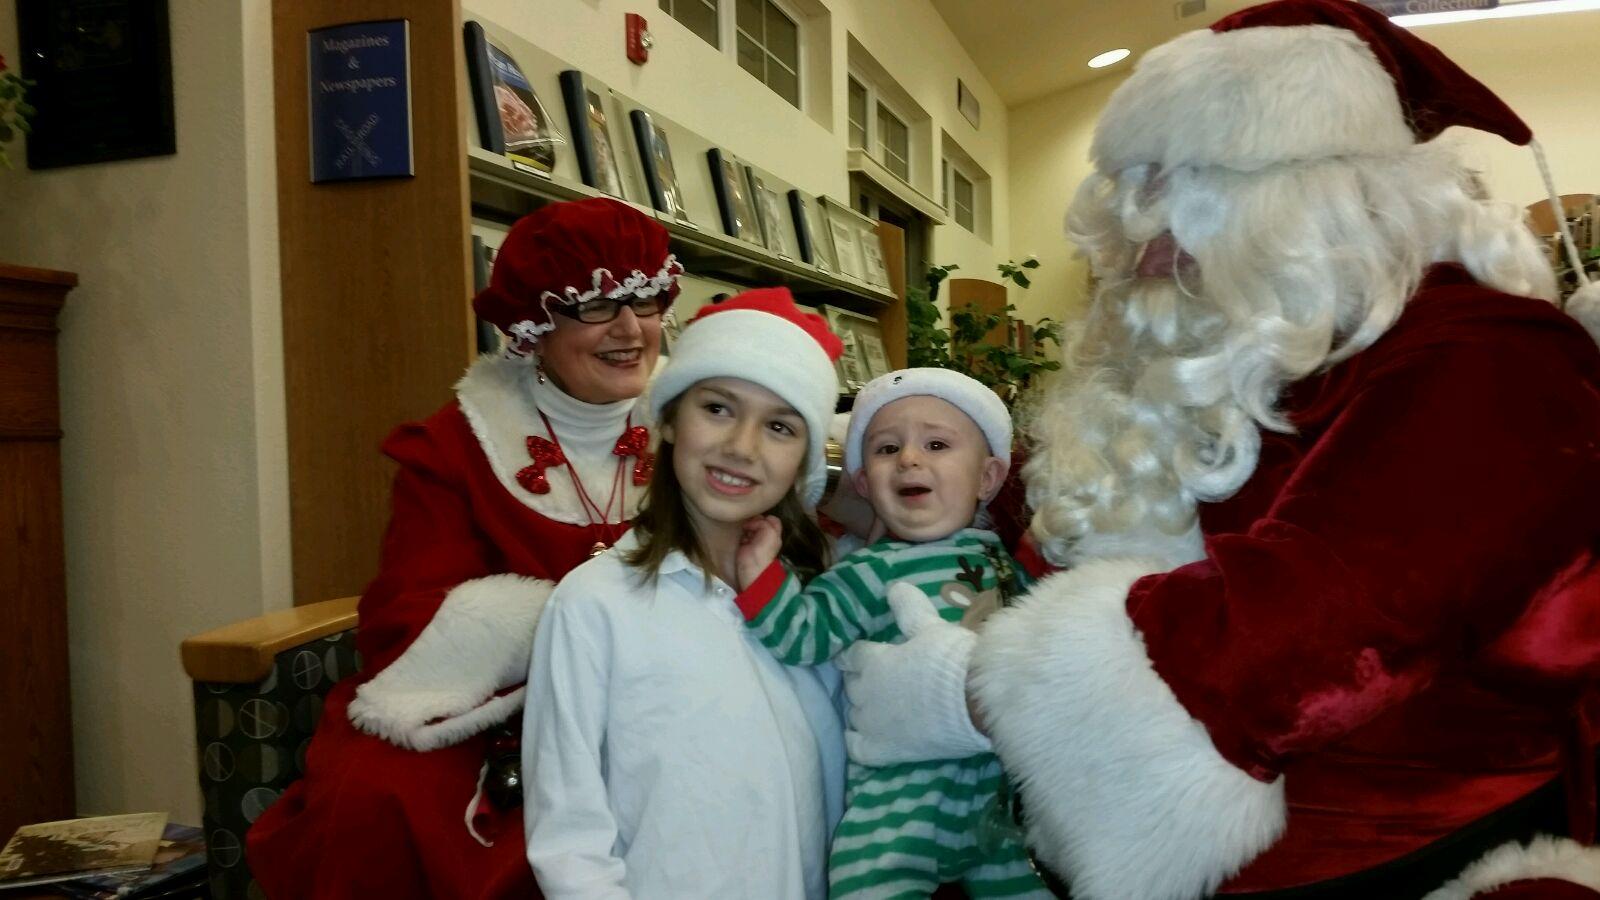 Mr. & Mrs. Santa visit the library